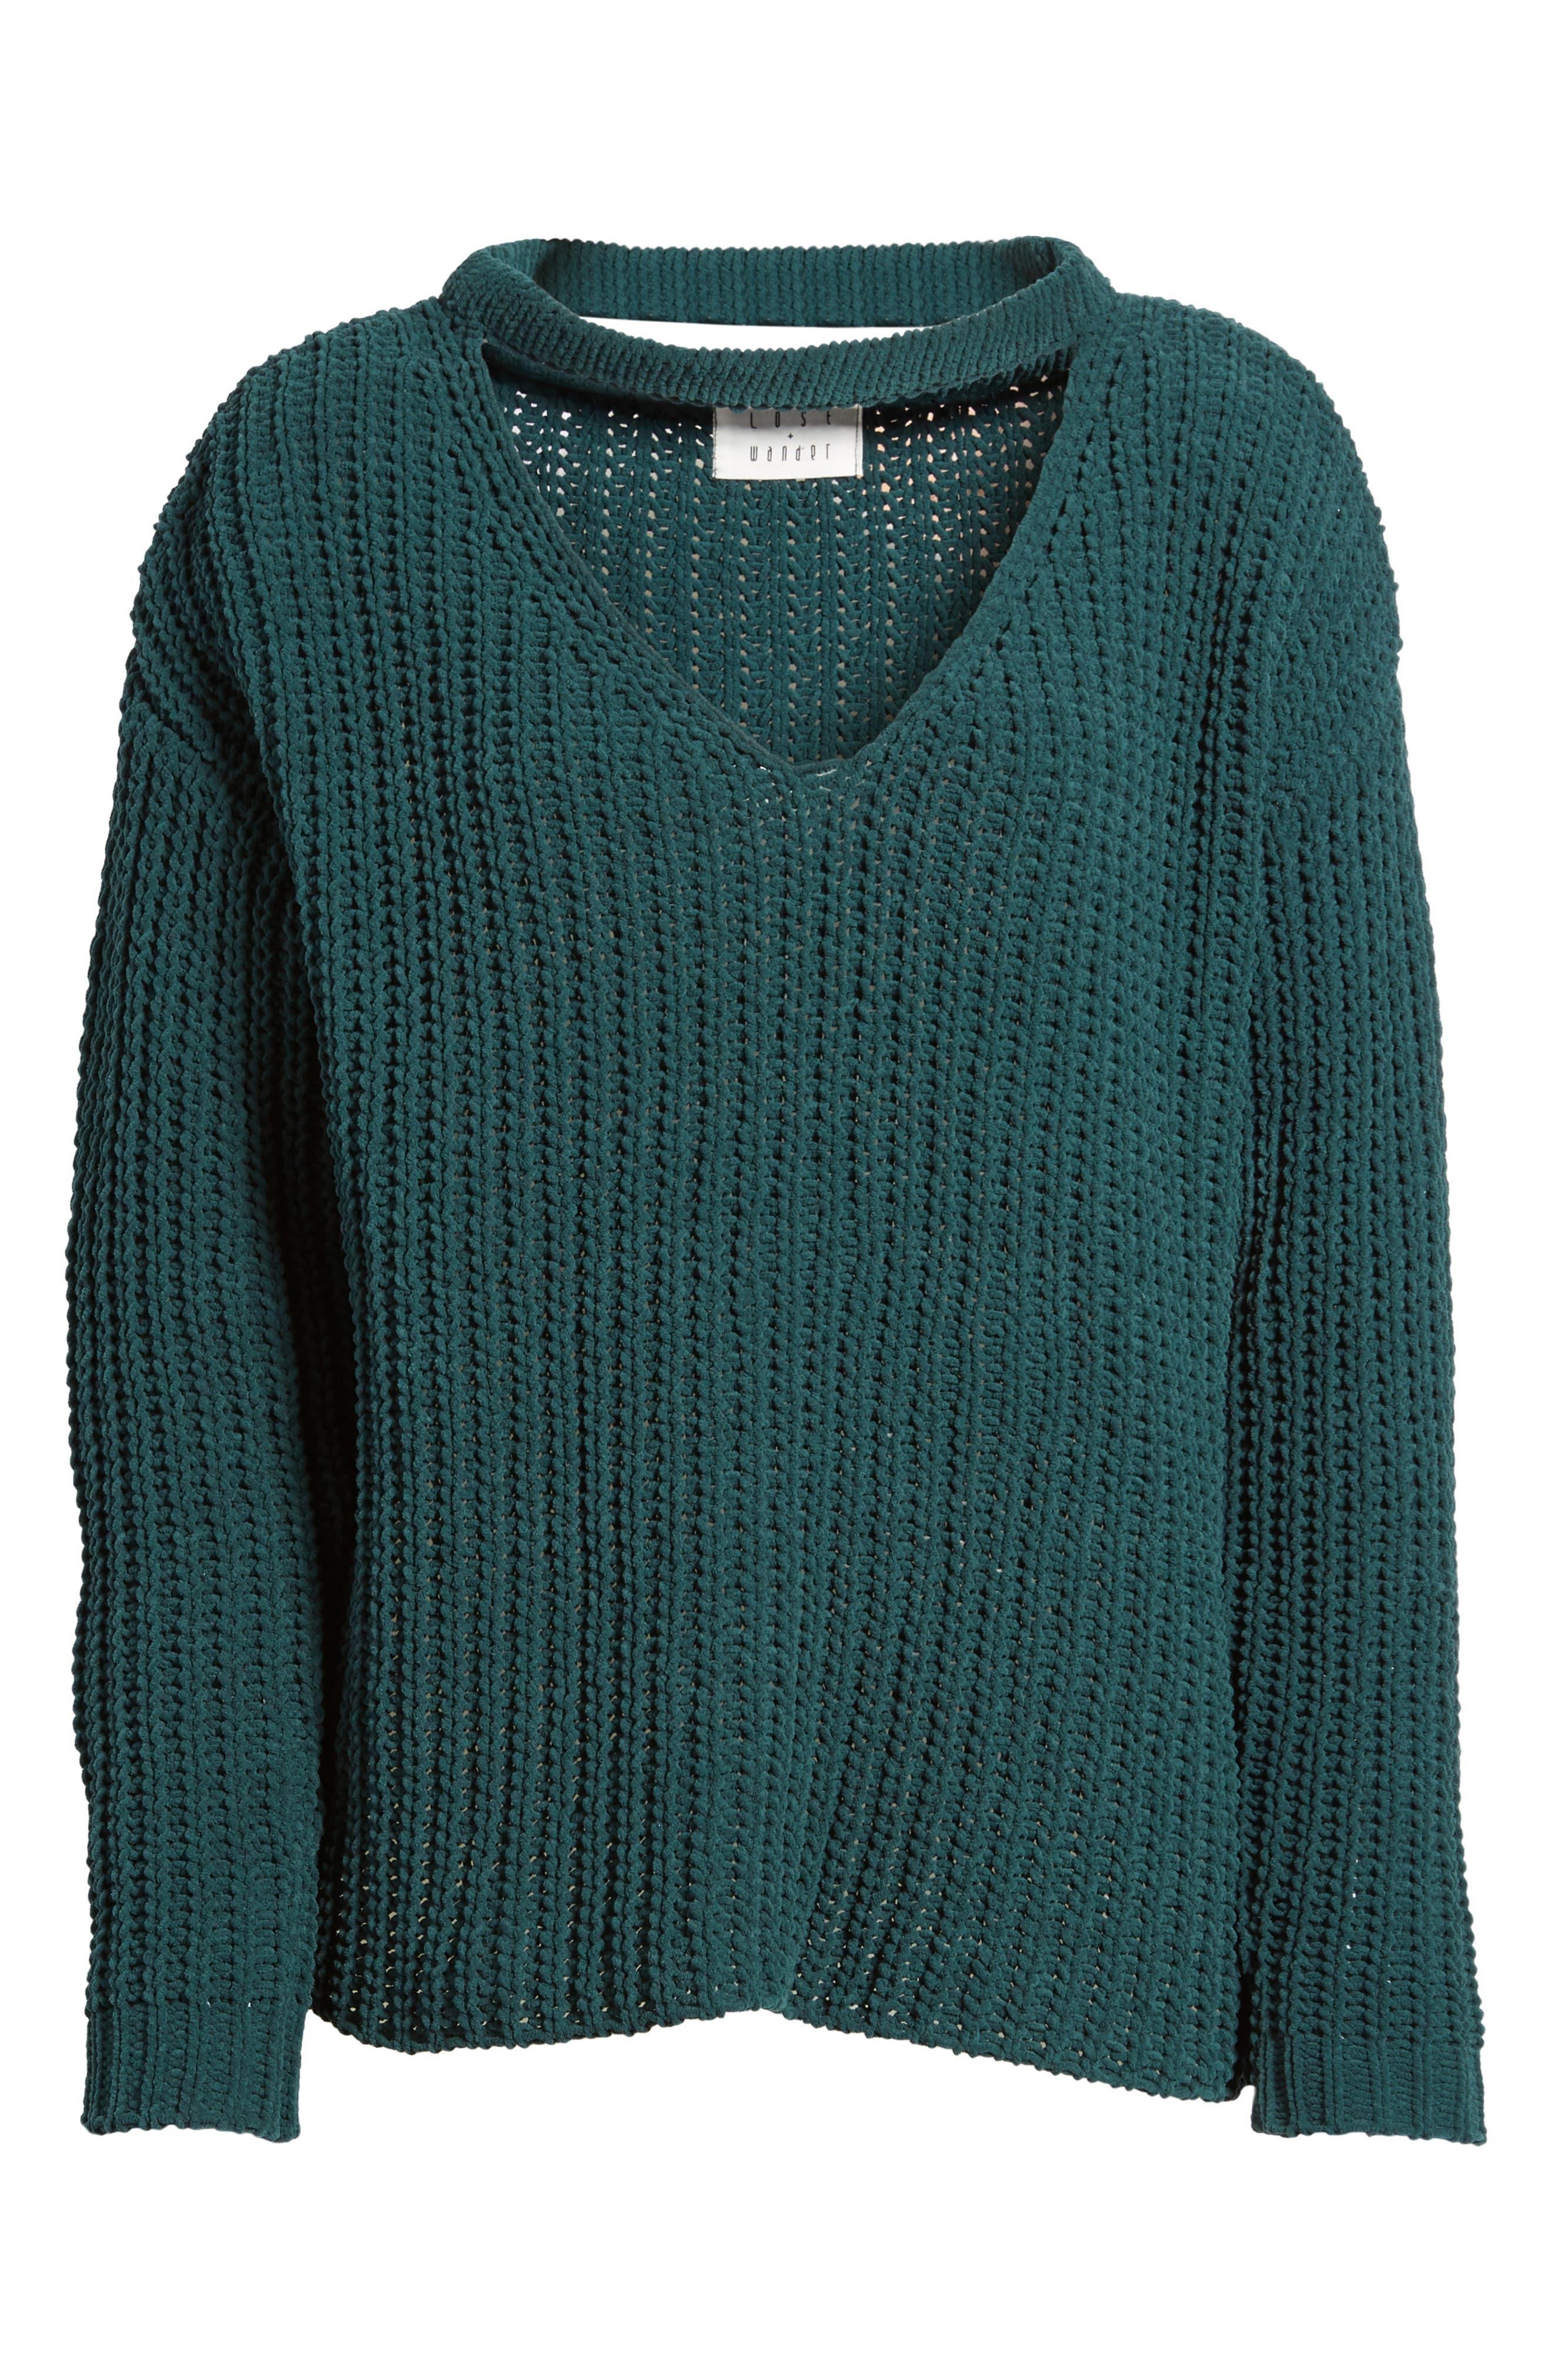 Mary Lous Choker Sweater,                             Alternate thumbnail 6, color,                             300